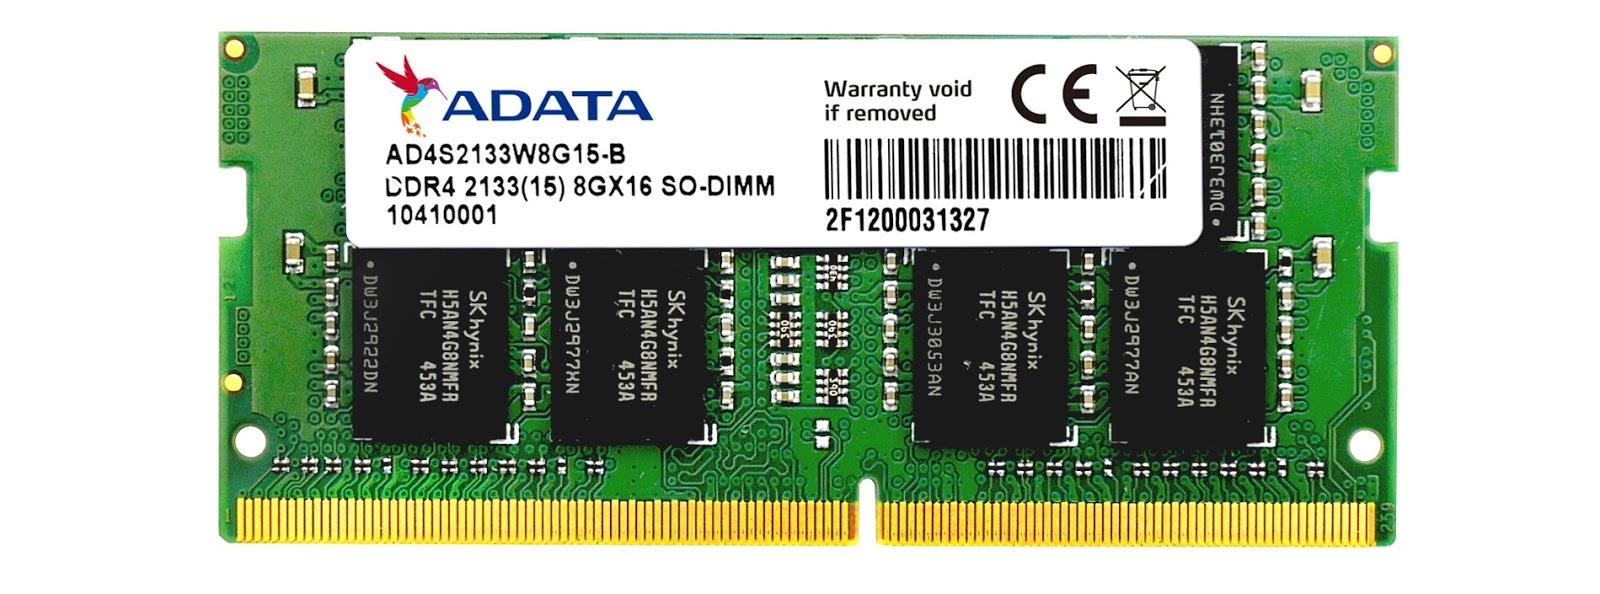 ADATA DDR4 2133 SO-DIMM Memory